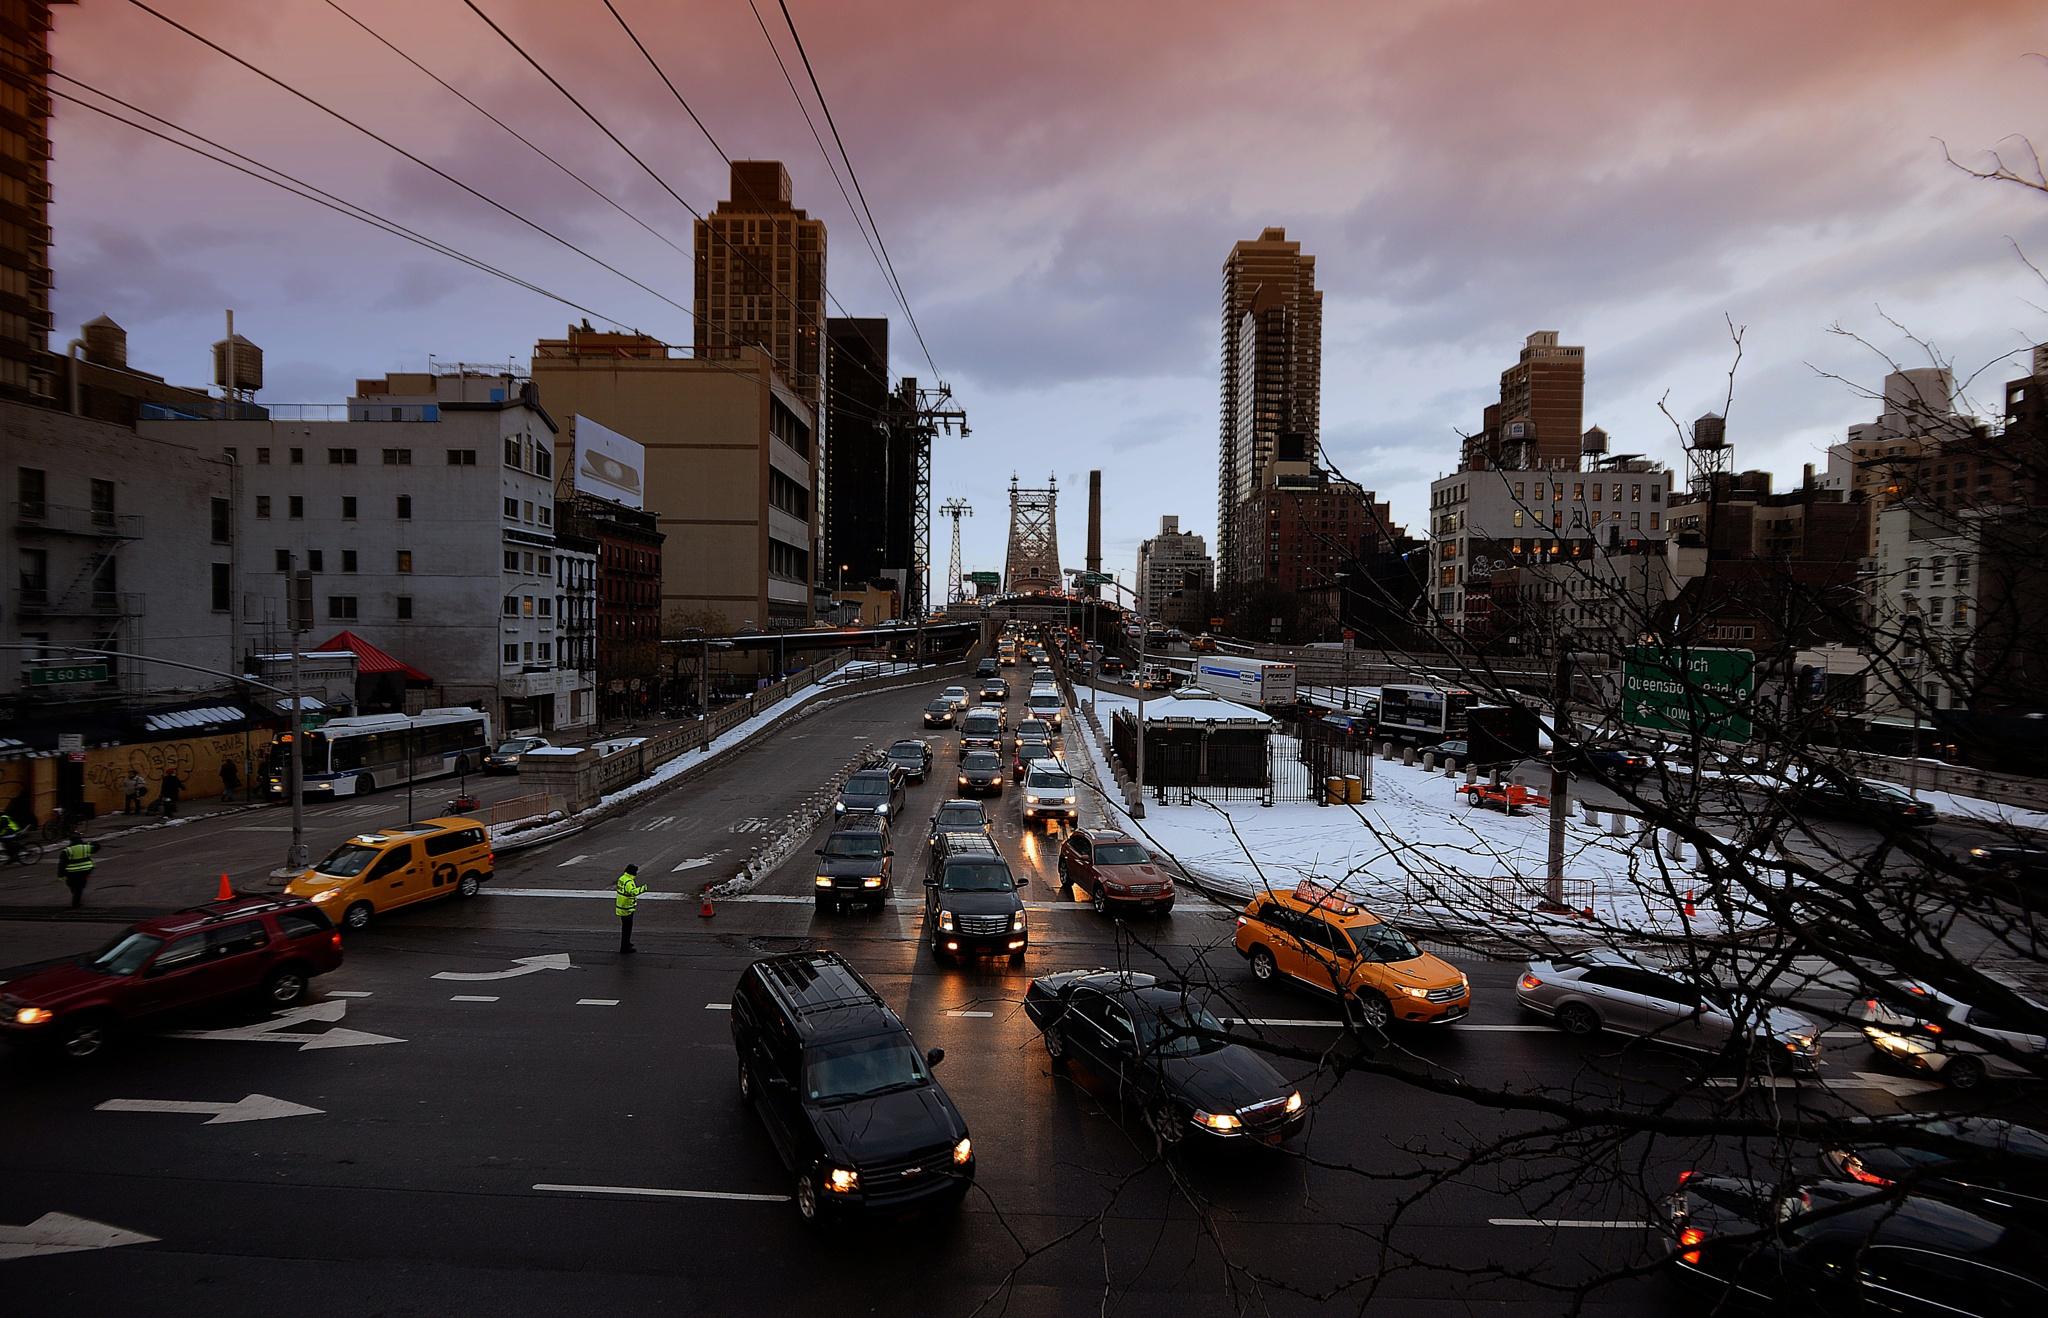 Roosevelt Island Tramway by Nelson Sibulo